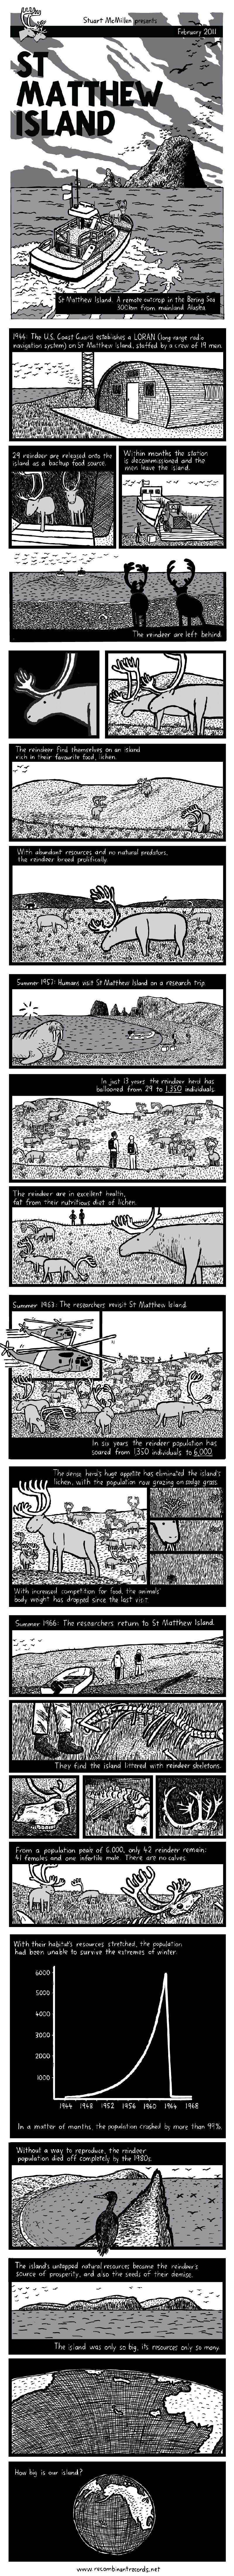 reindeer island comic St. Matthew Island [Comic Strip]